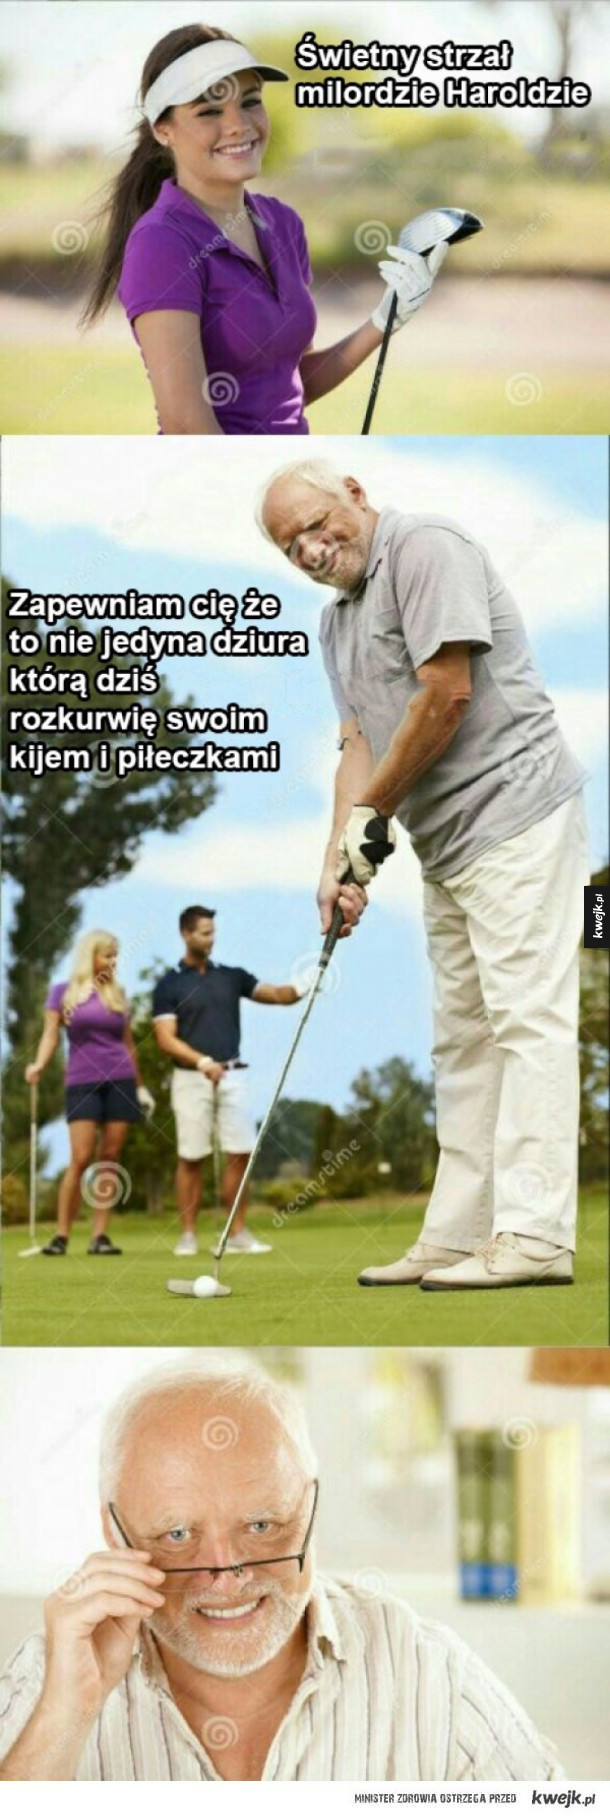 Dziwny pan golfista